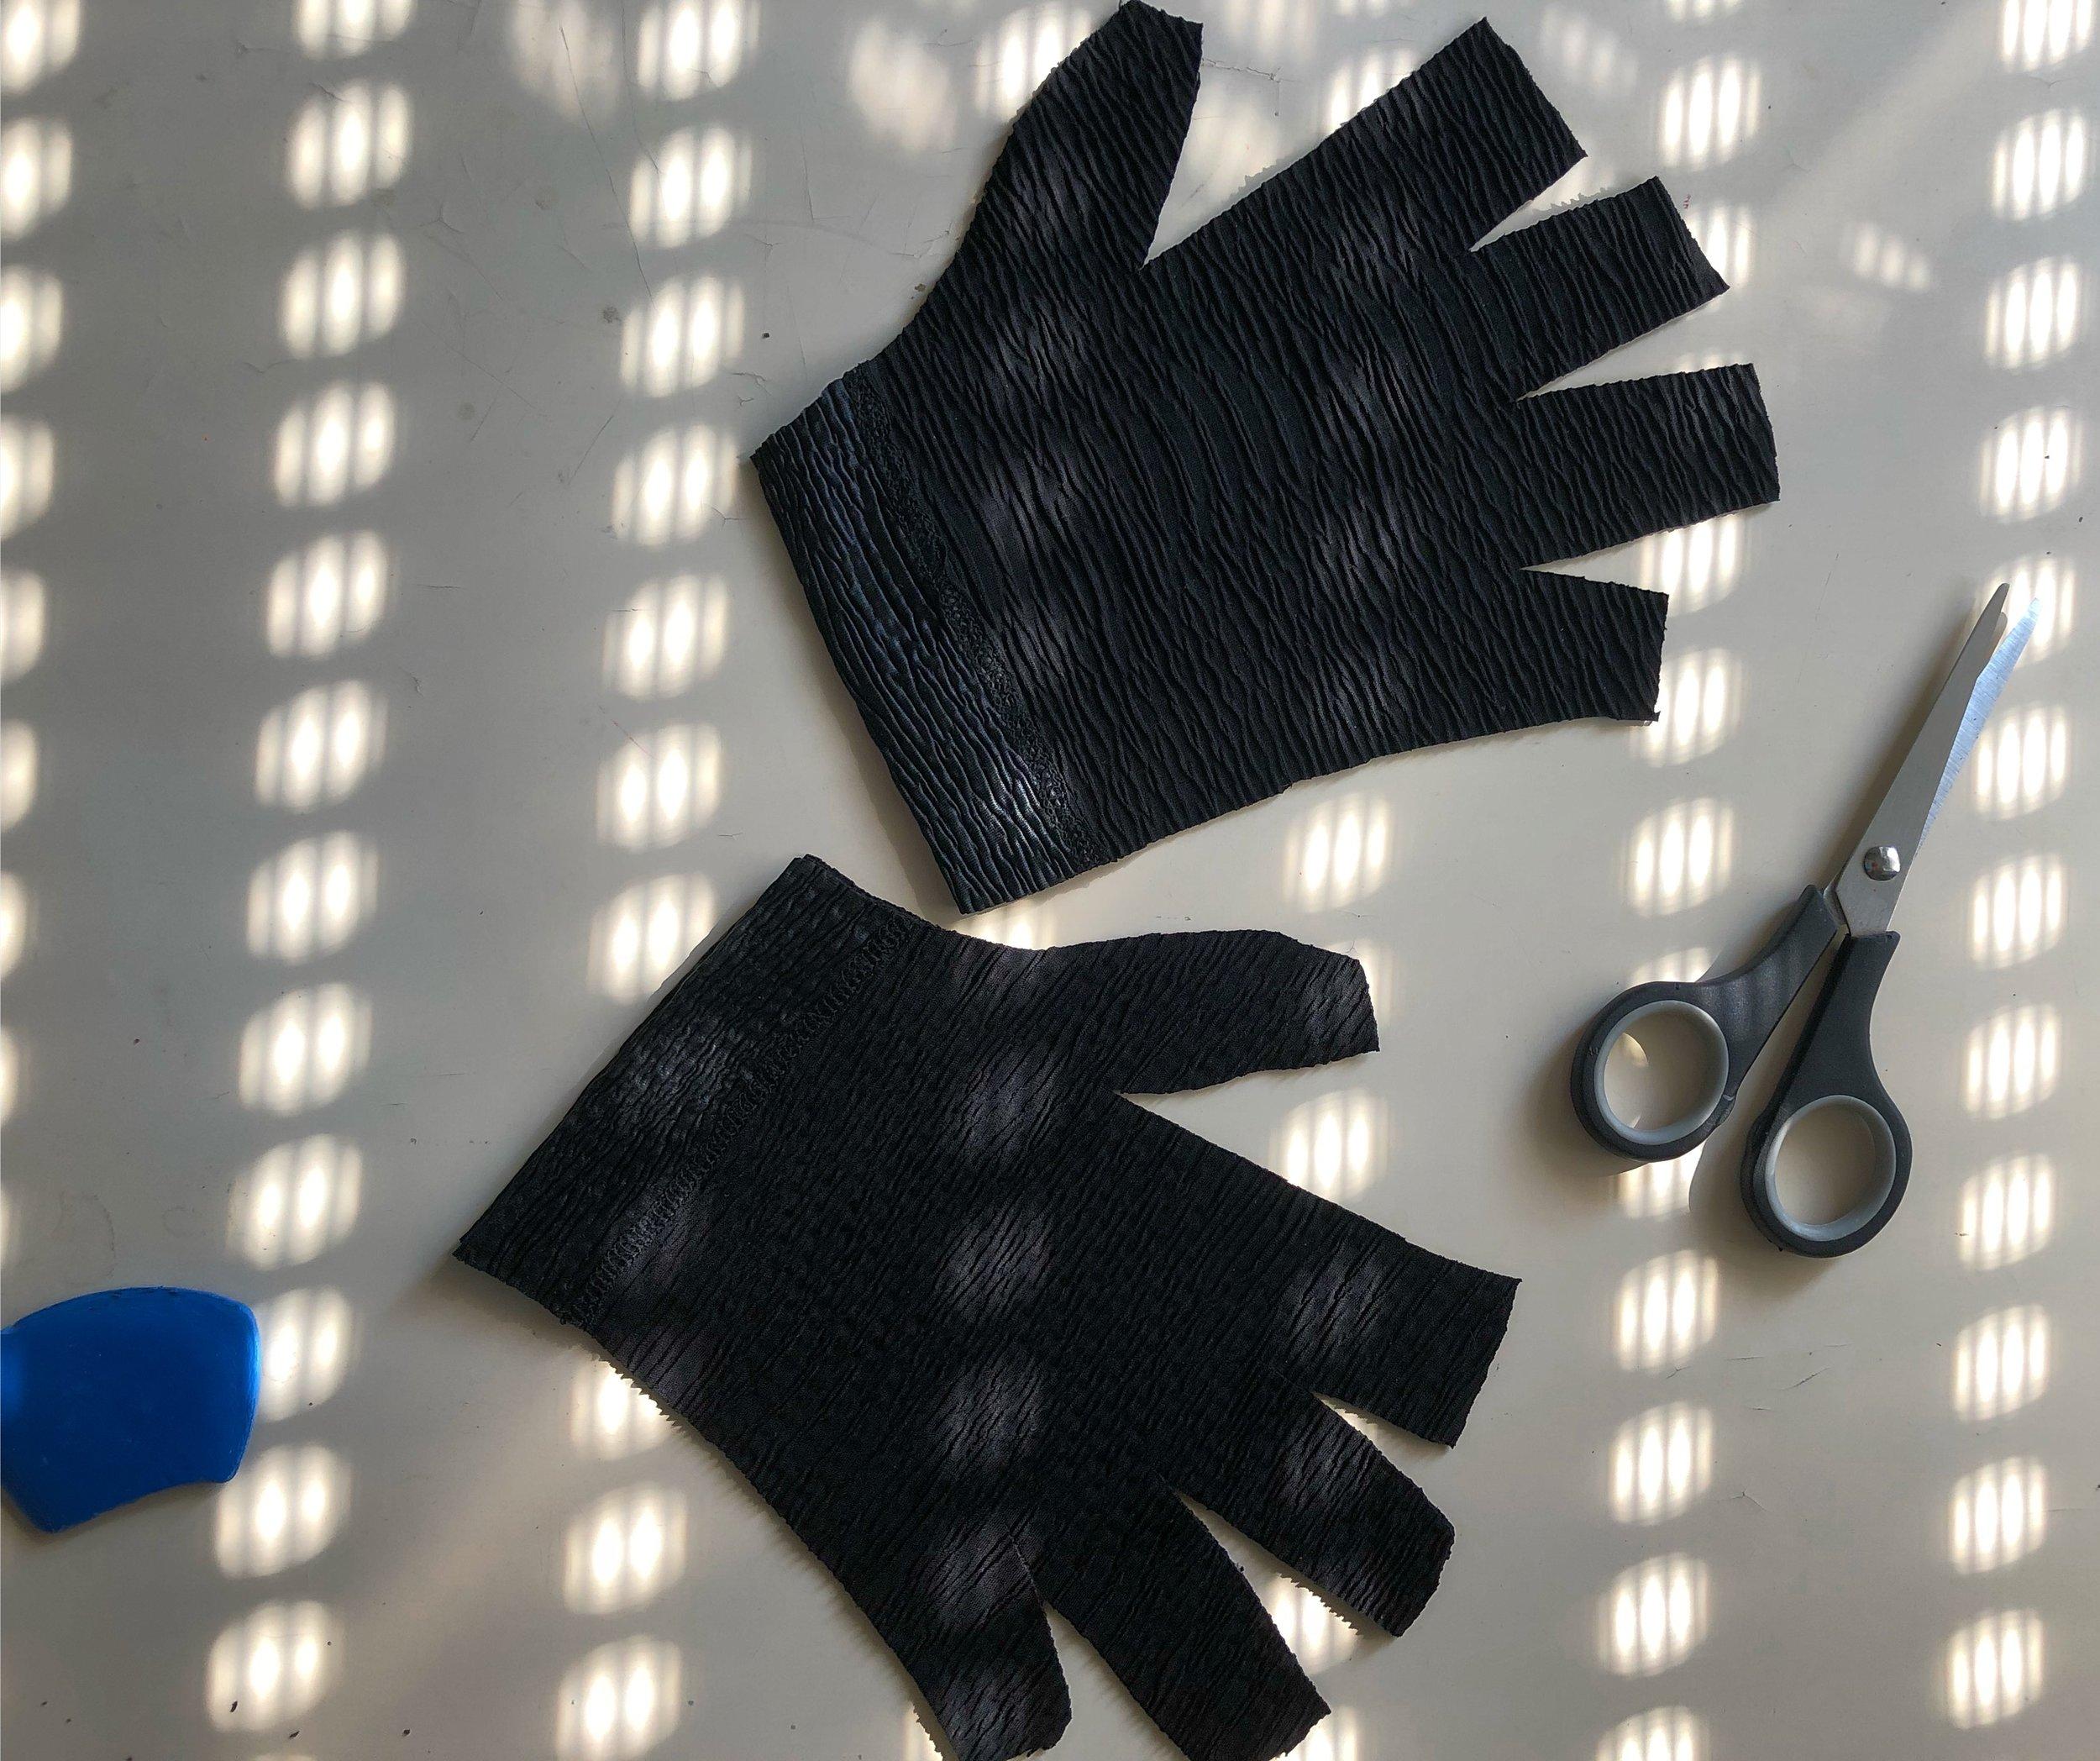 GlovesCutOut.jpg